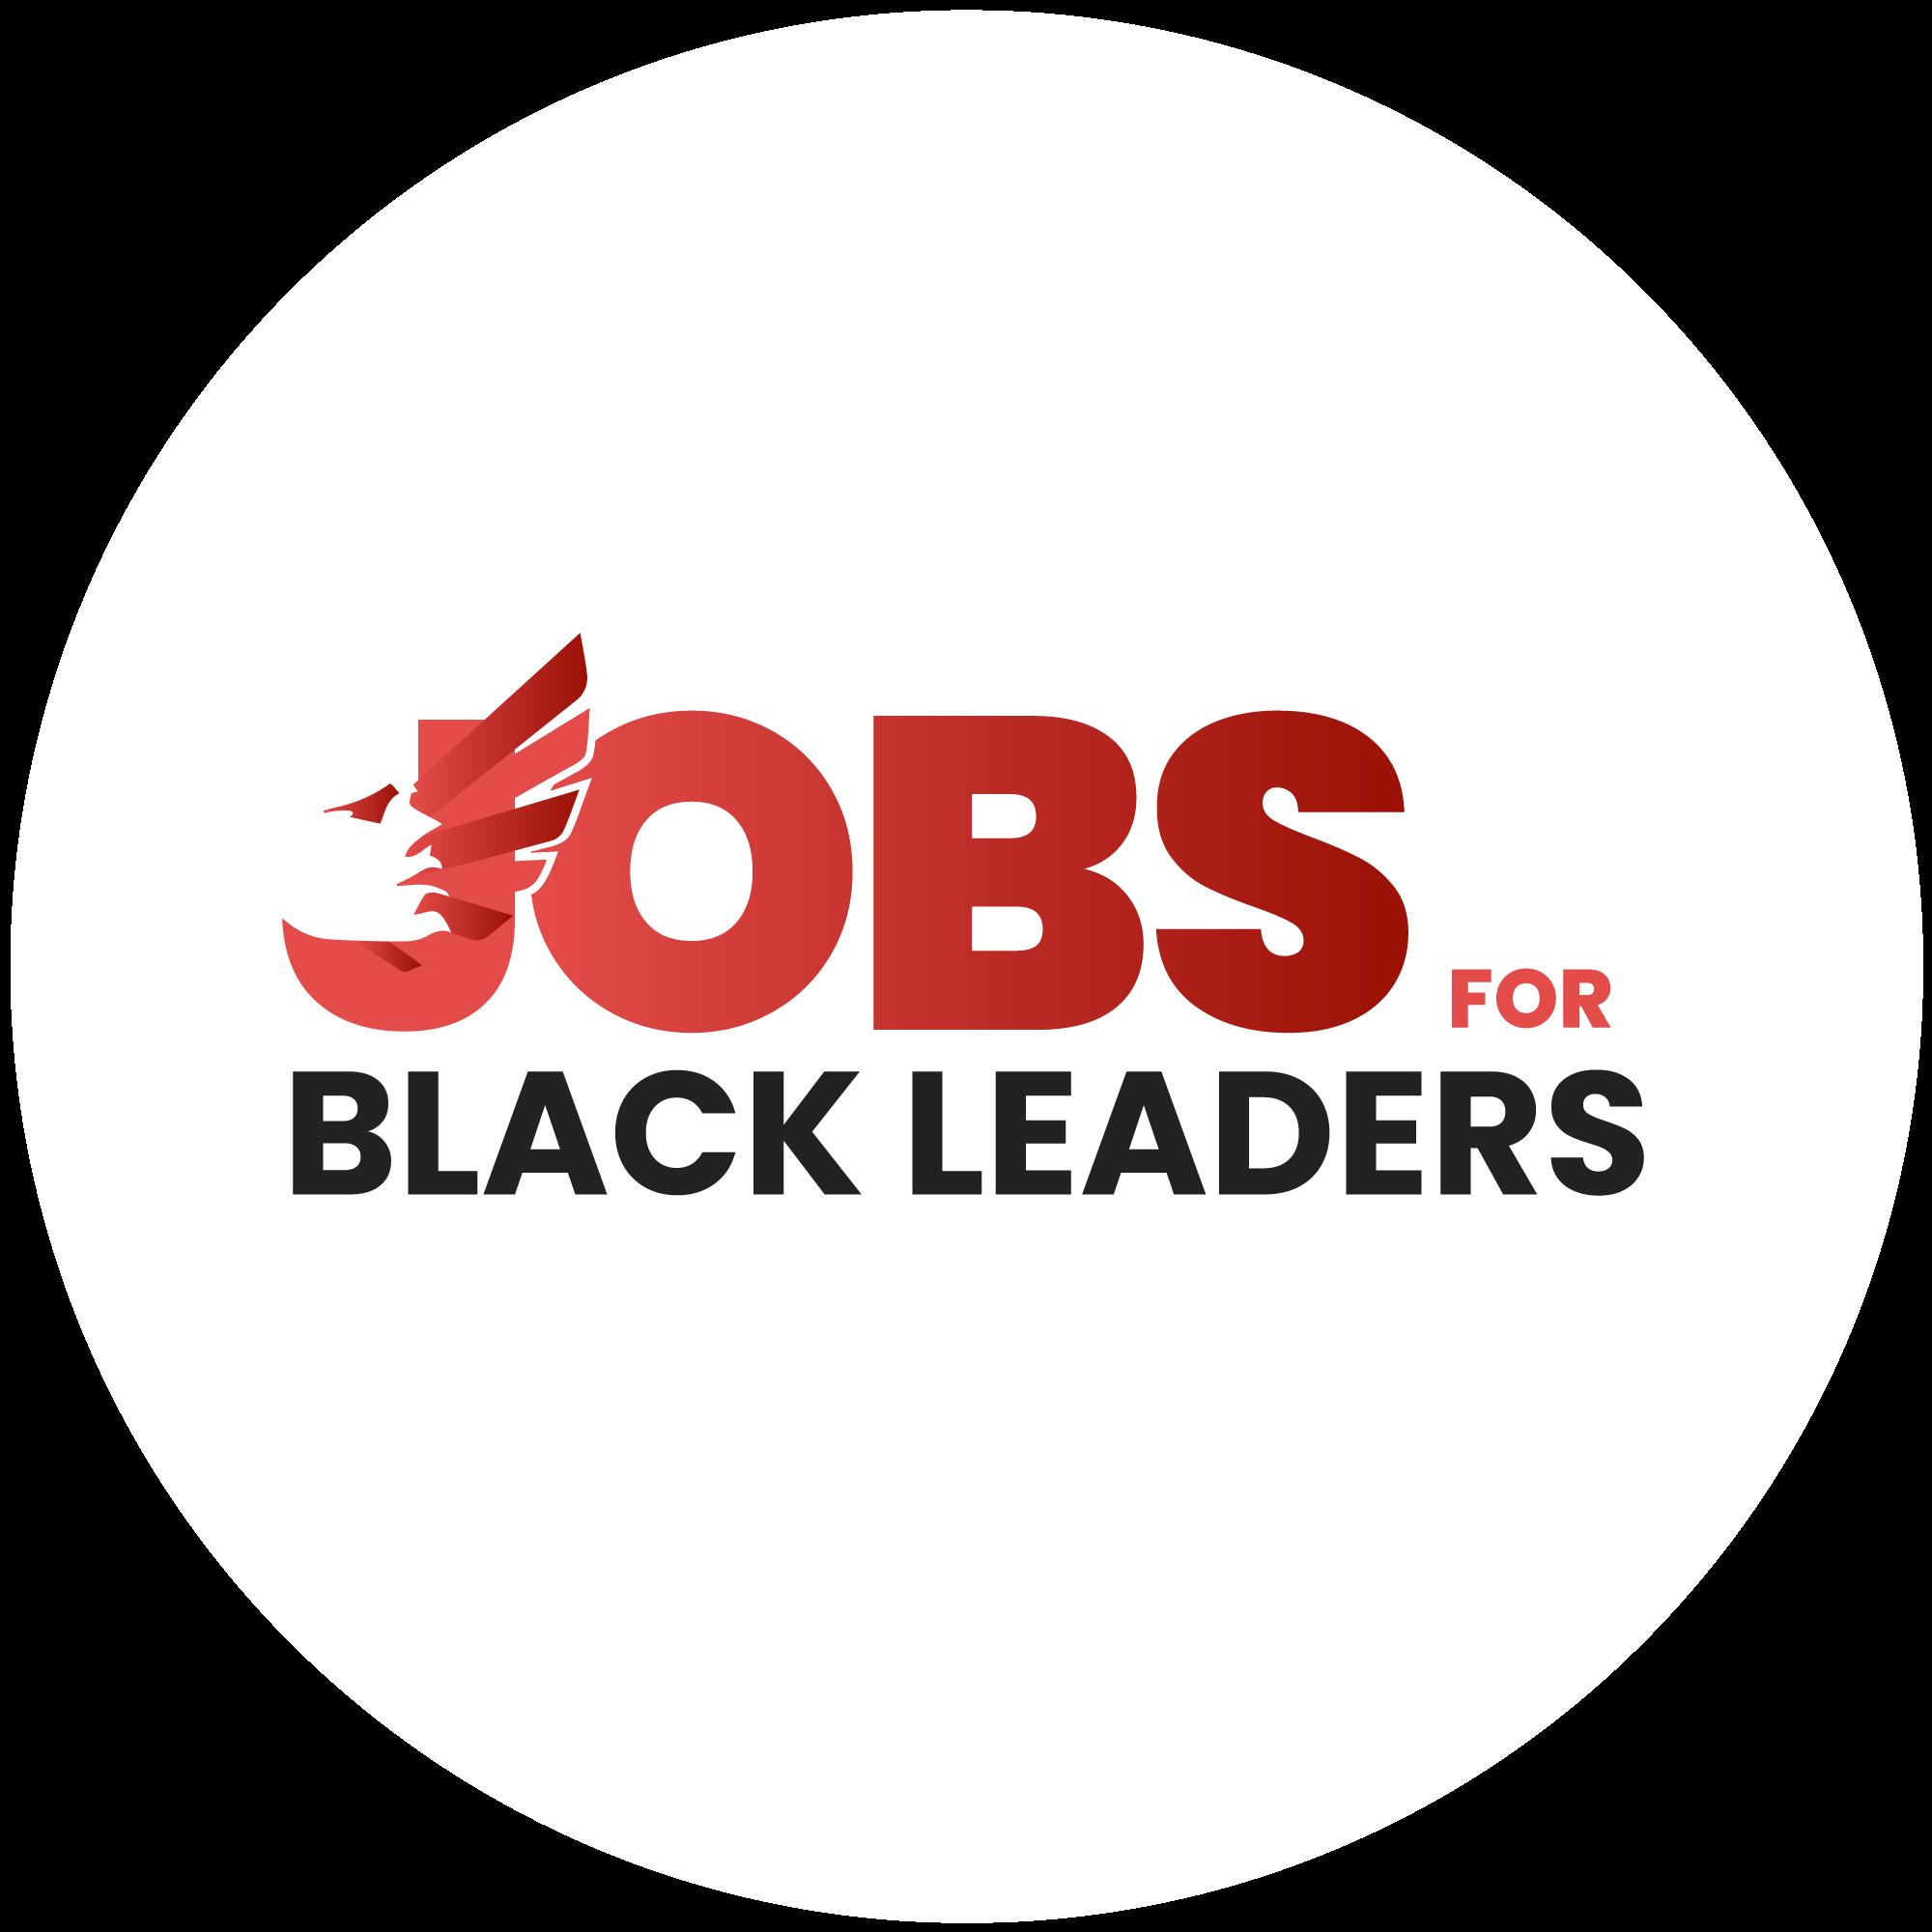 Jobs for Black Leaders